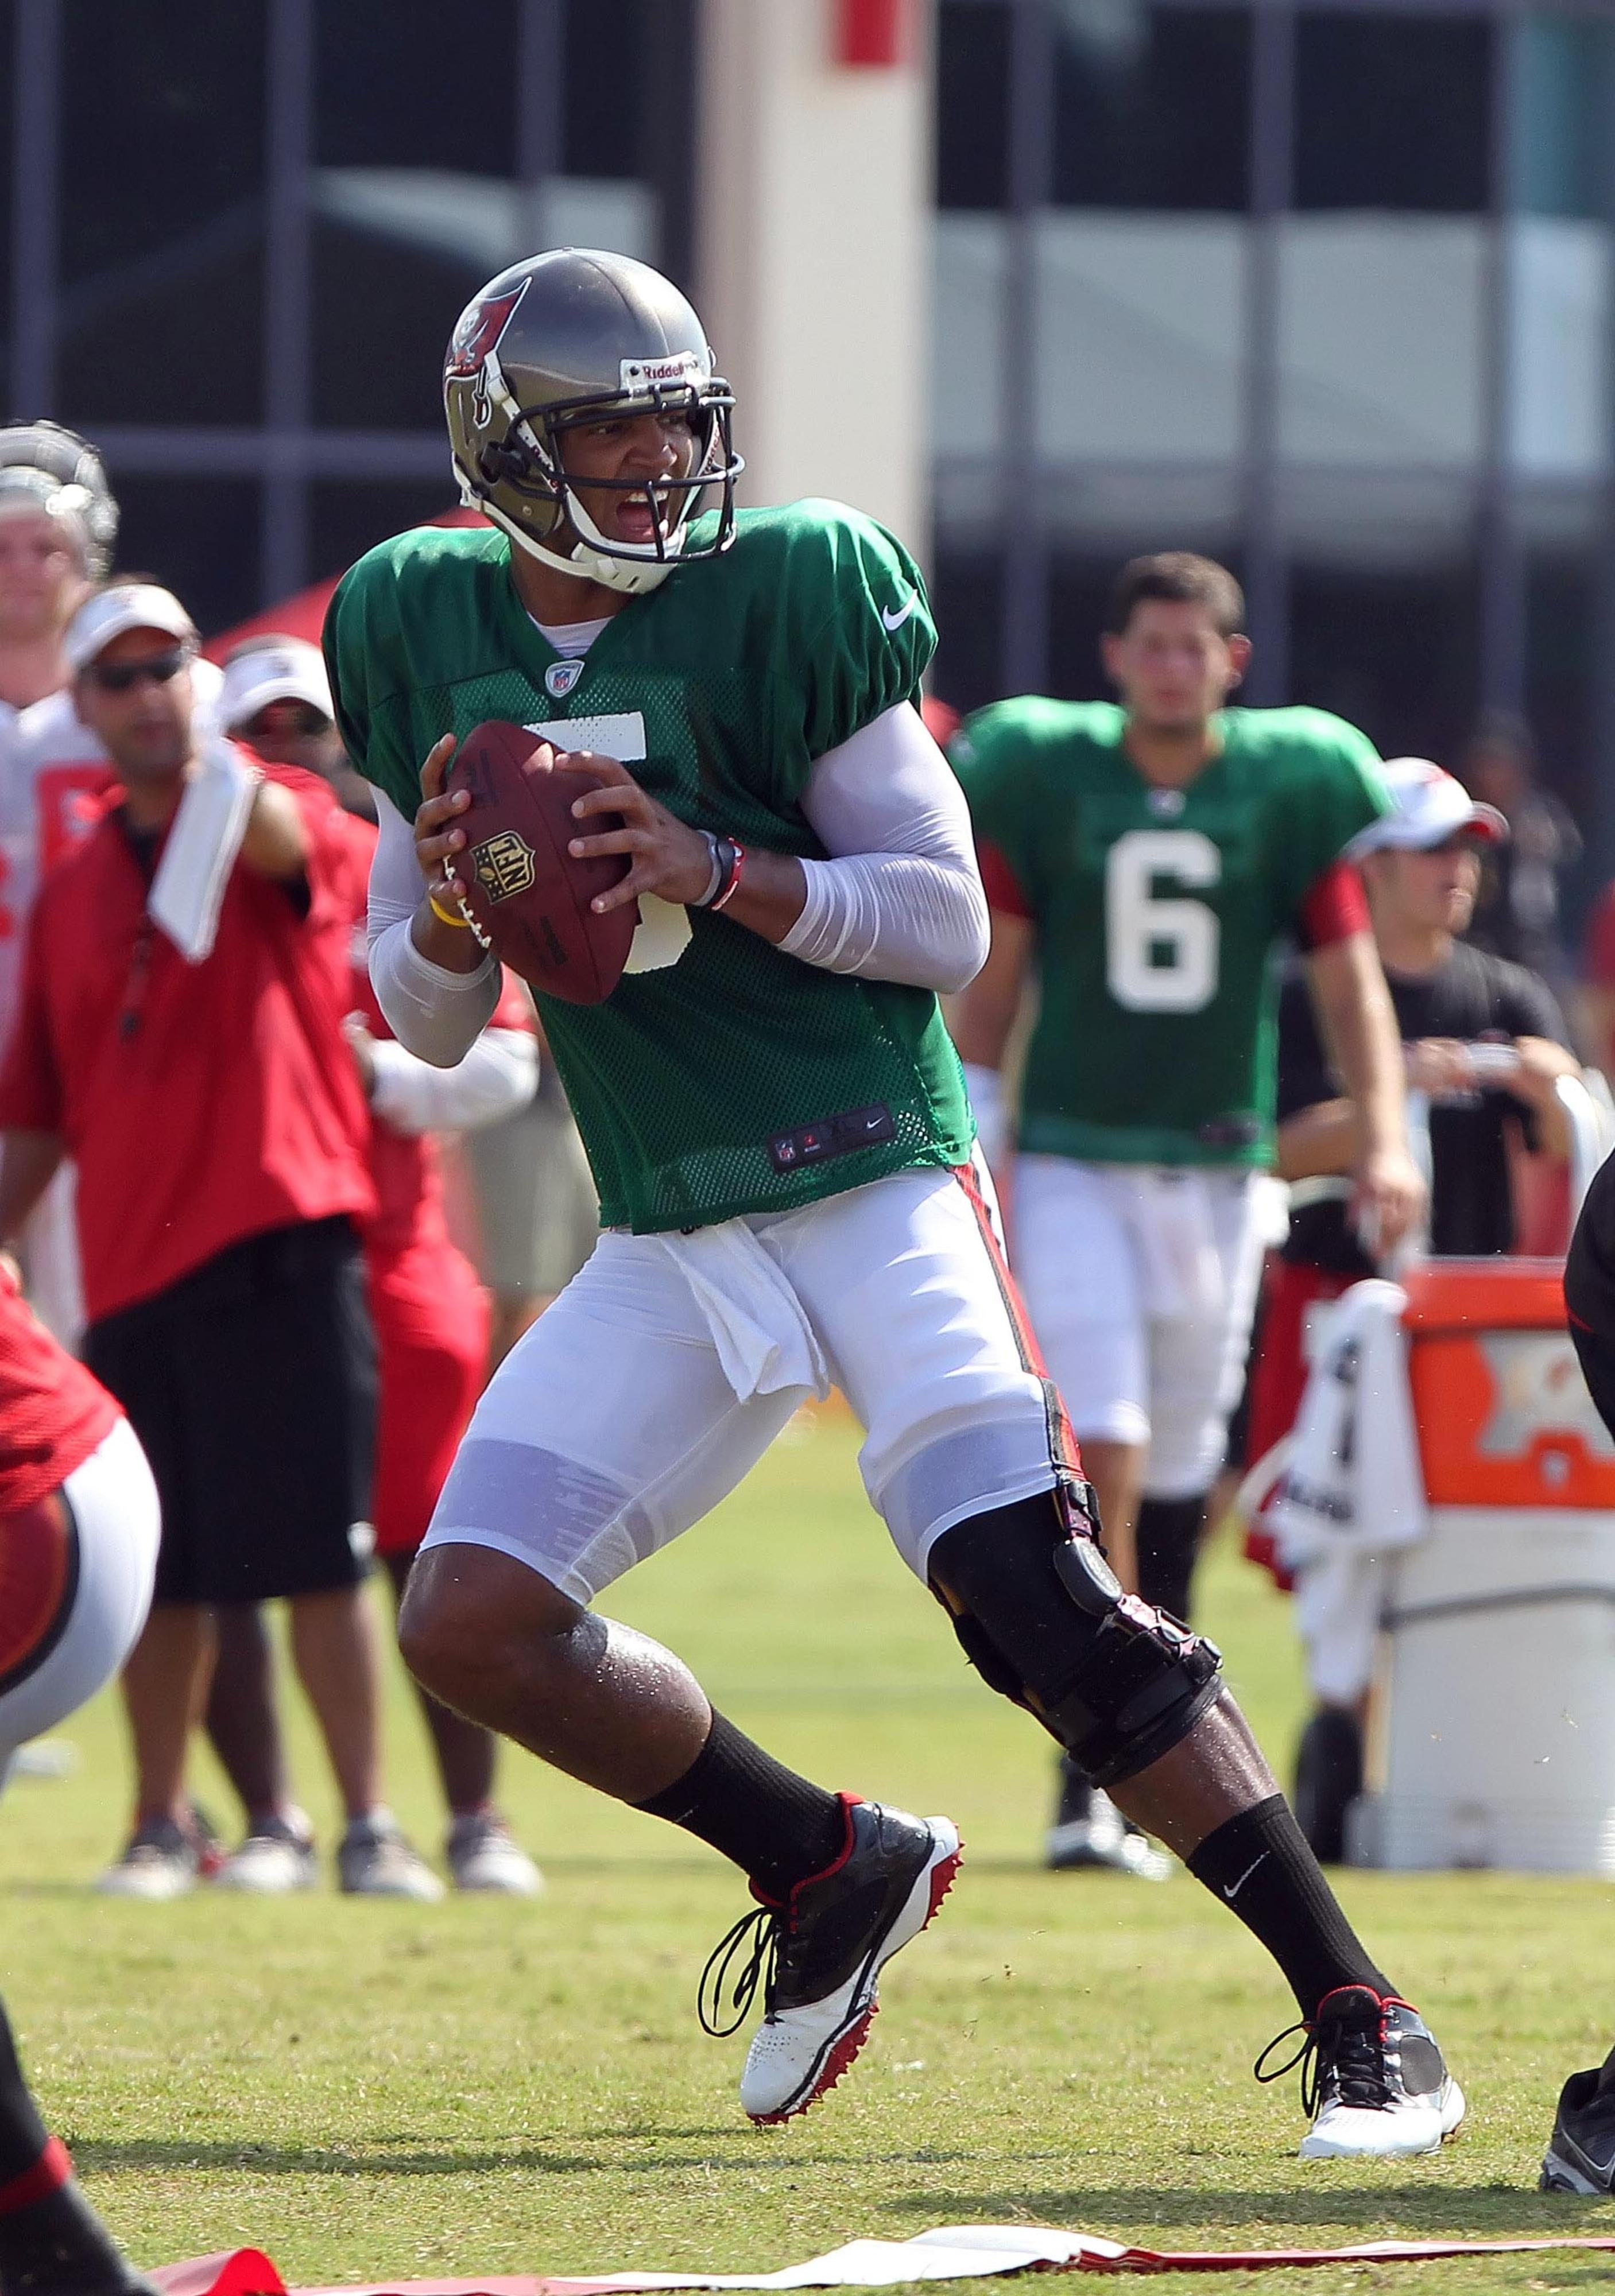 August 3, 2012; Tampa, FL, USA;  Tampa Bay Buccaneers quarterback Josh Freeman (5) drops back during training camp at One Buc Place. Mandatory Credit: Kim Klement-US PRESSWIRE